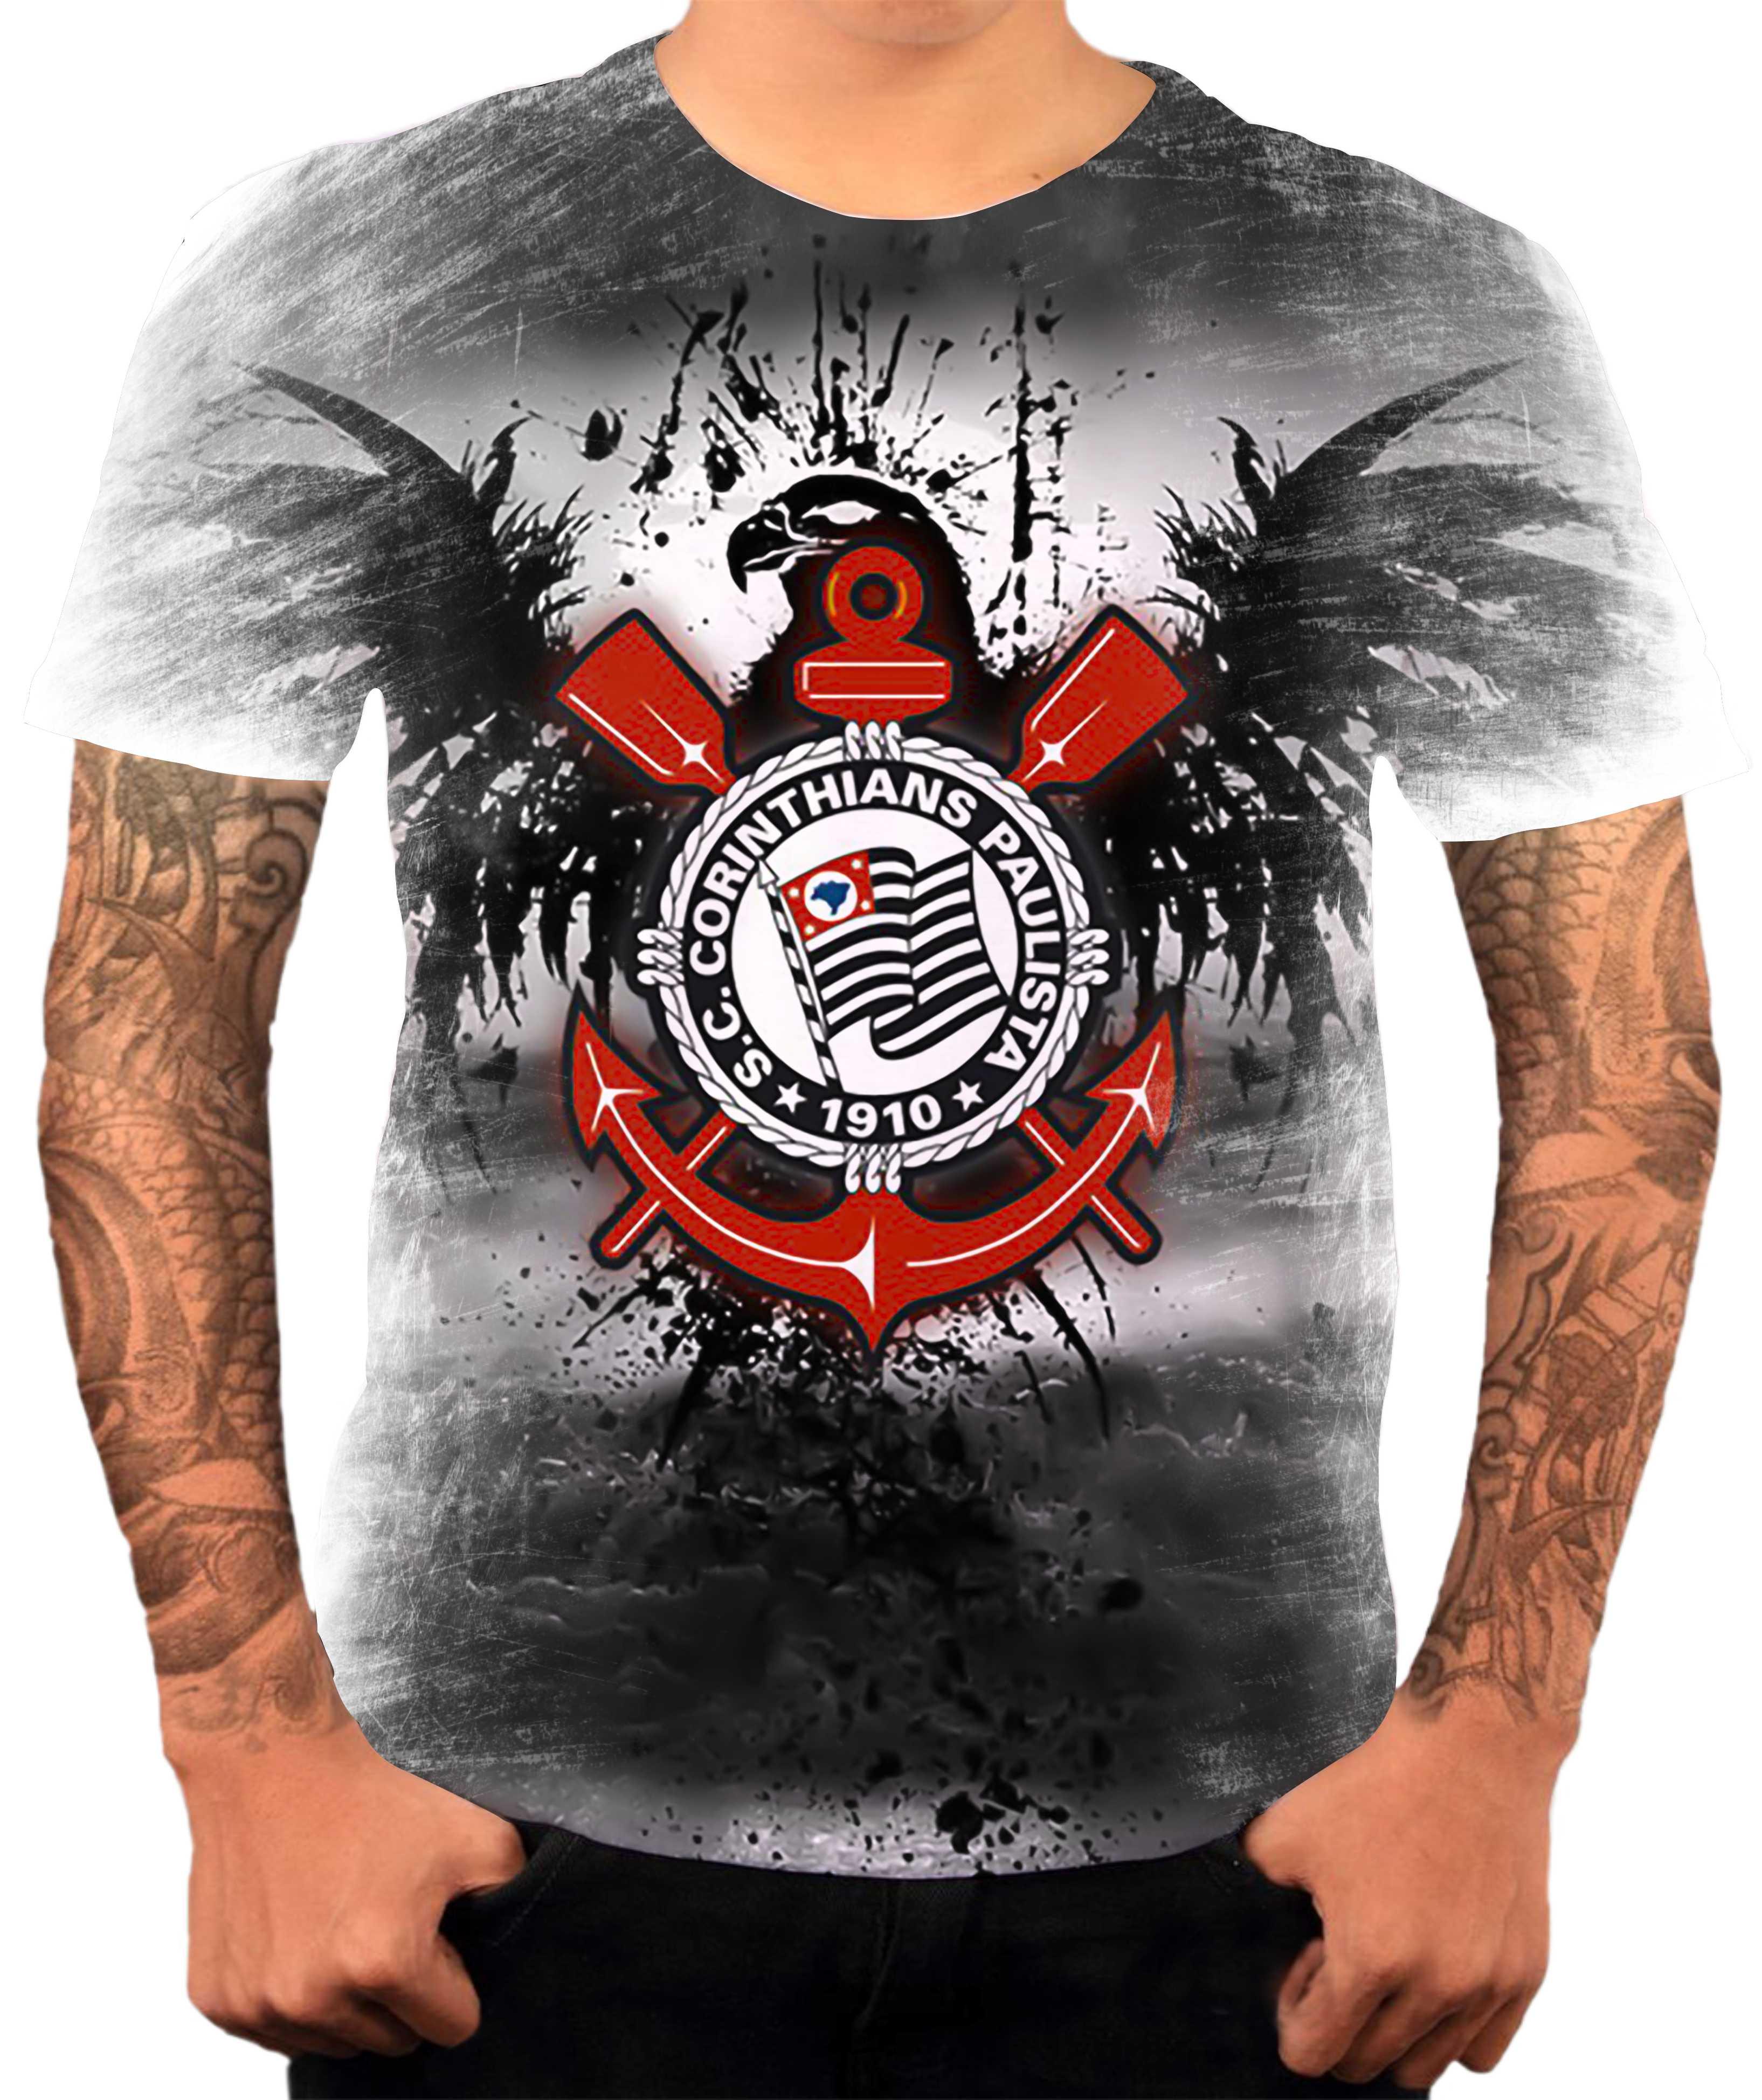 Camisa Camiseta Personalizada Time de Futebol Corinthians 2  e9997a9b7aac9